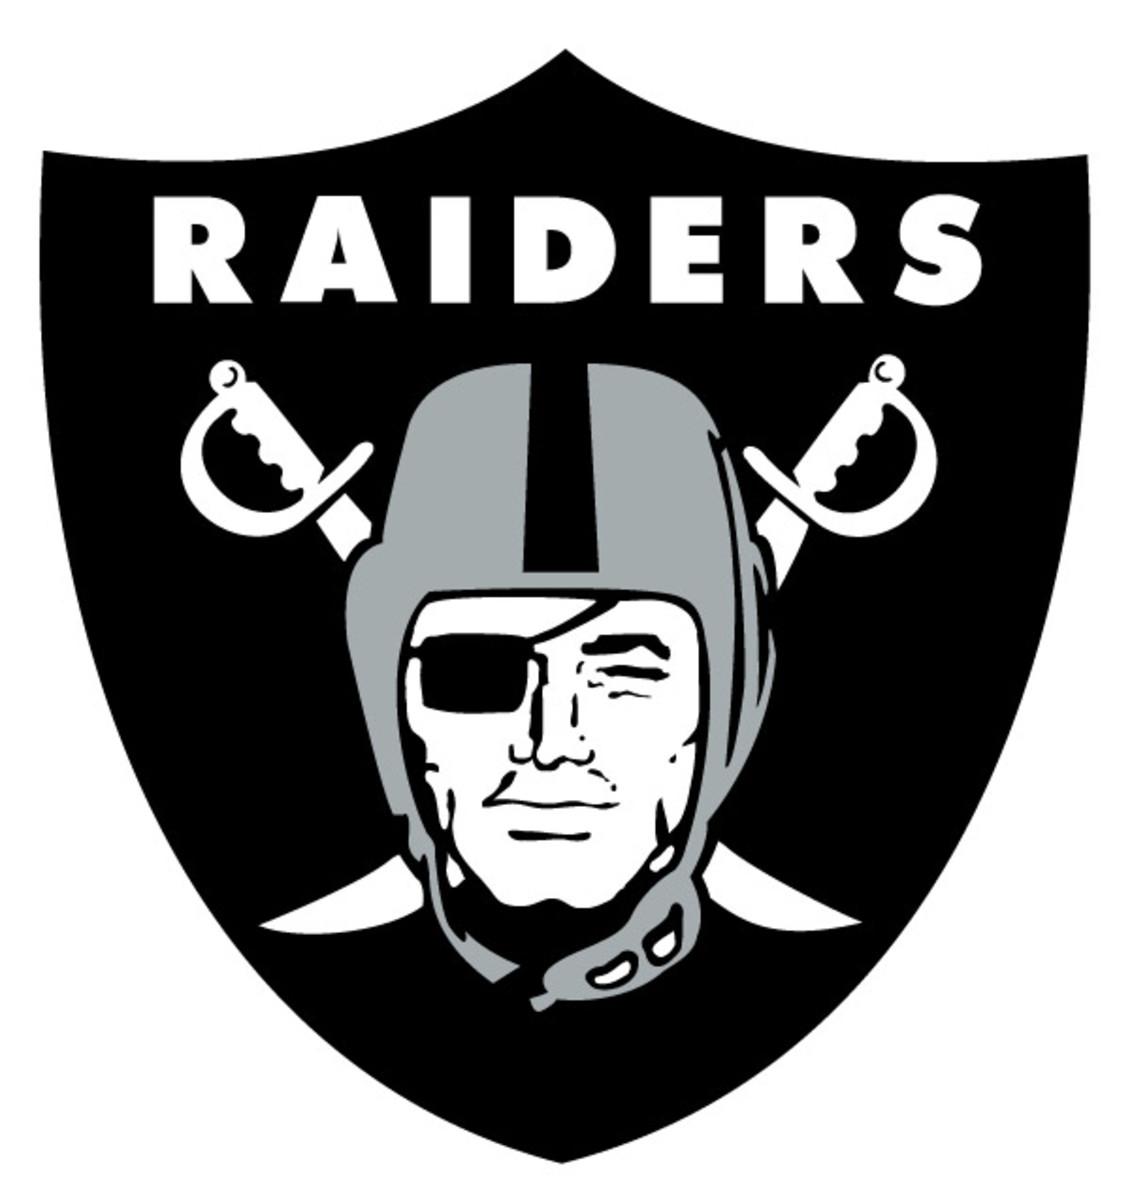 Oakland Raiders 2019 Schedule